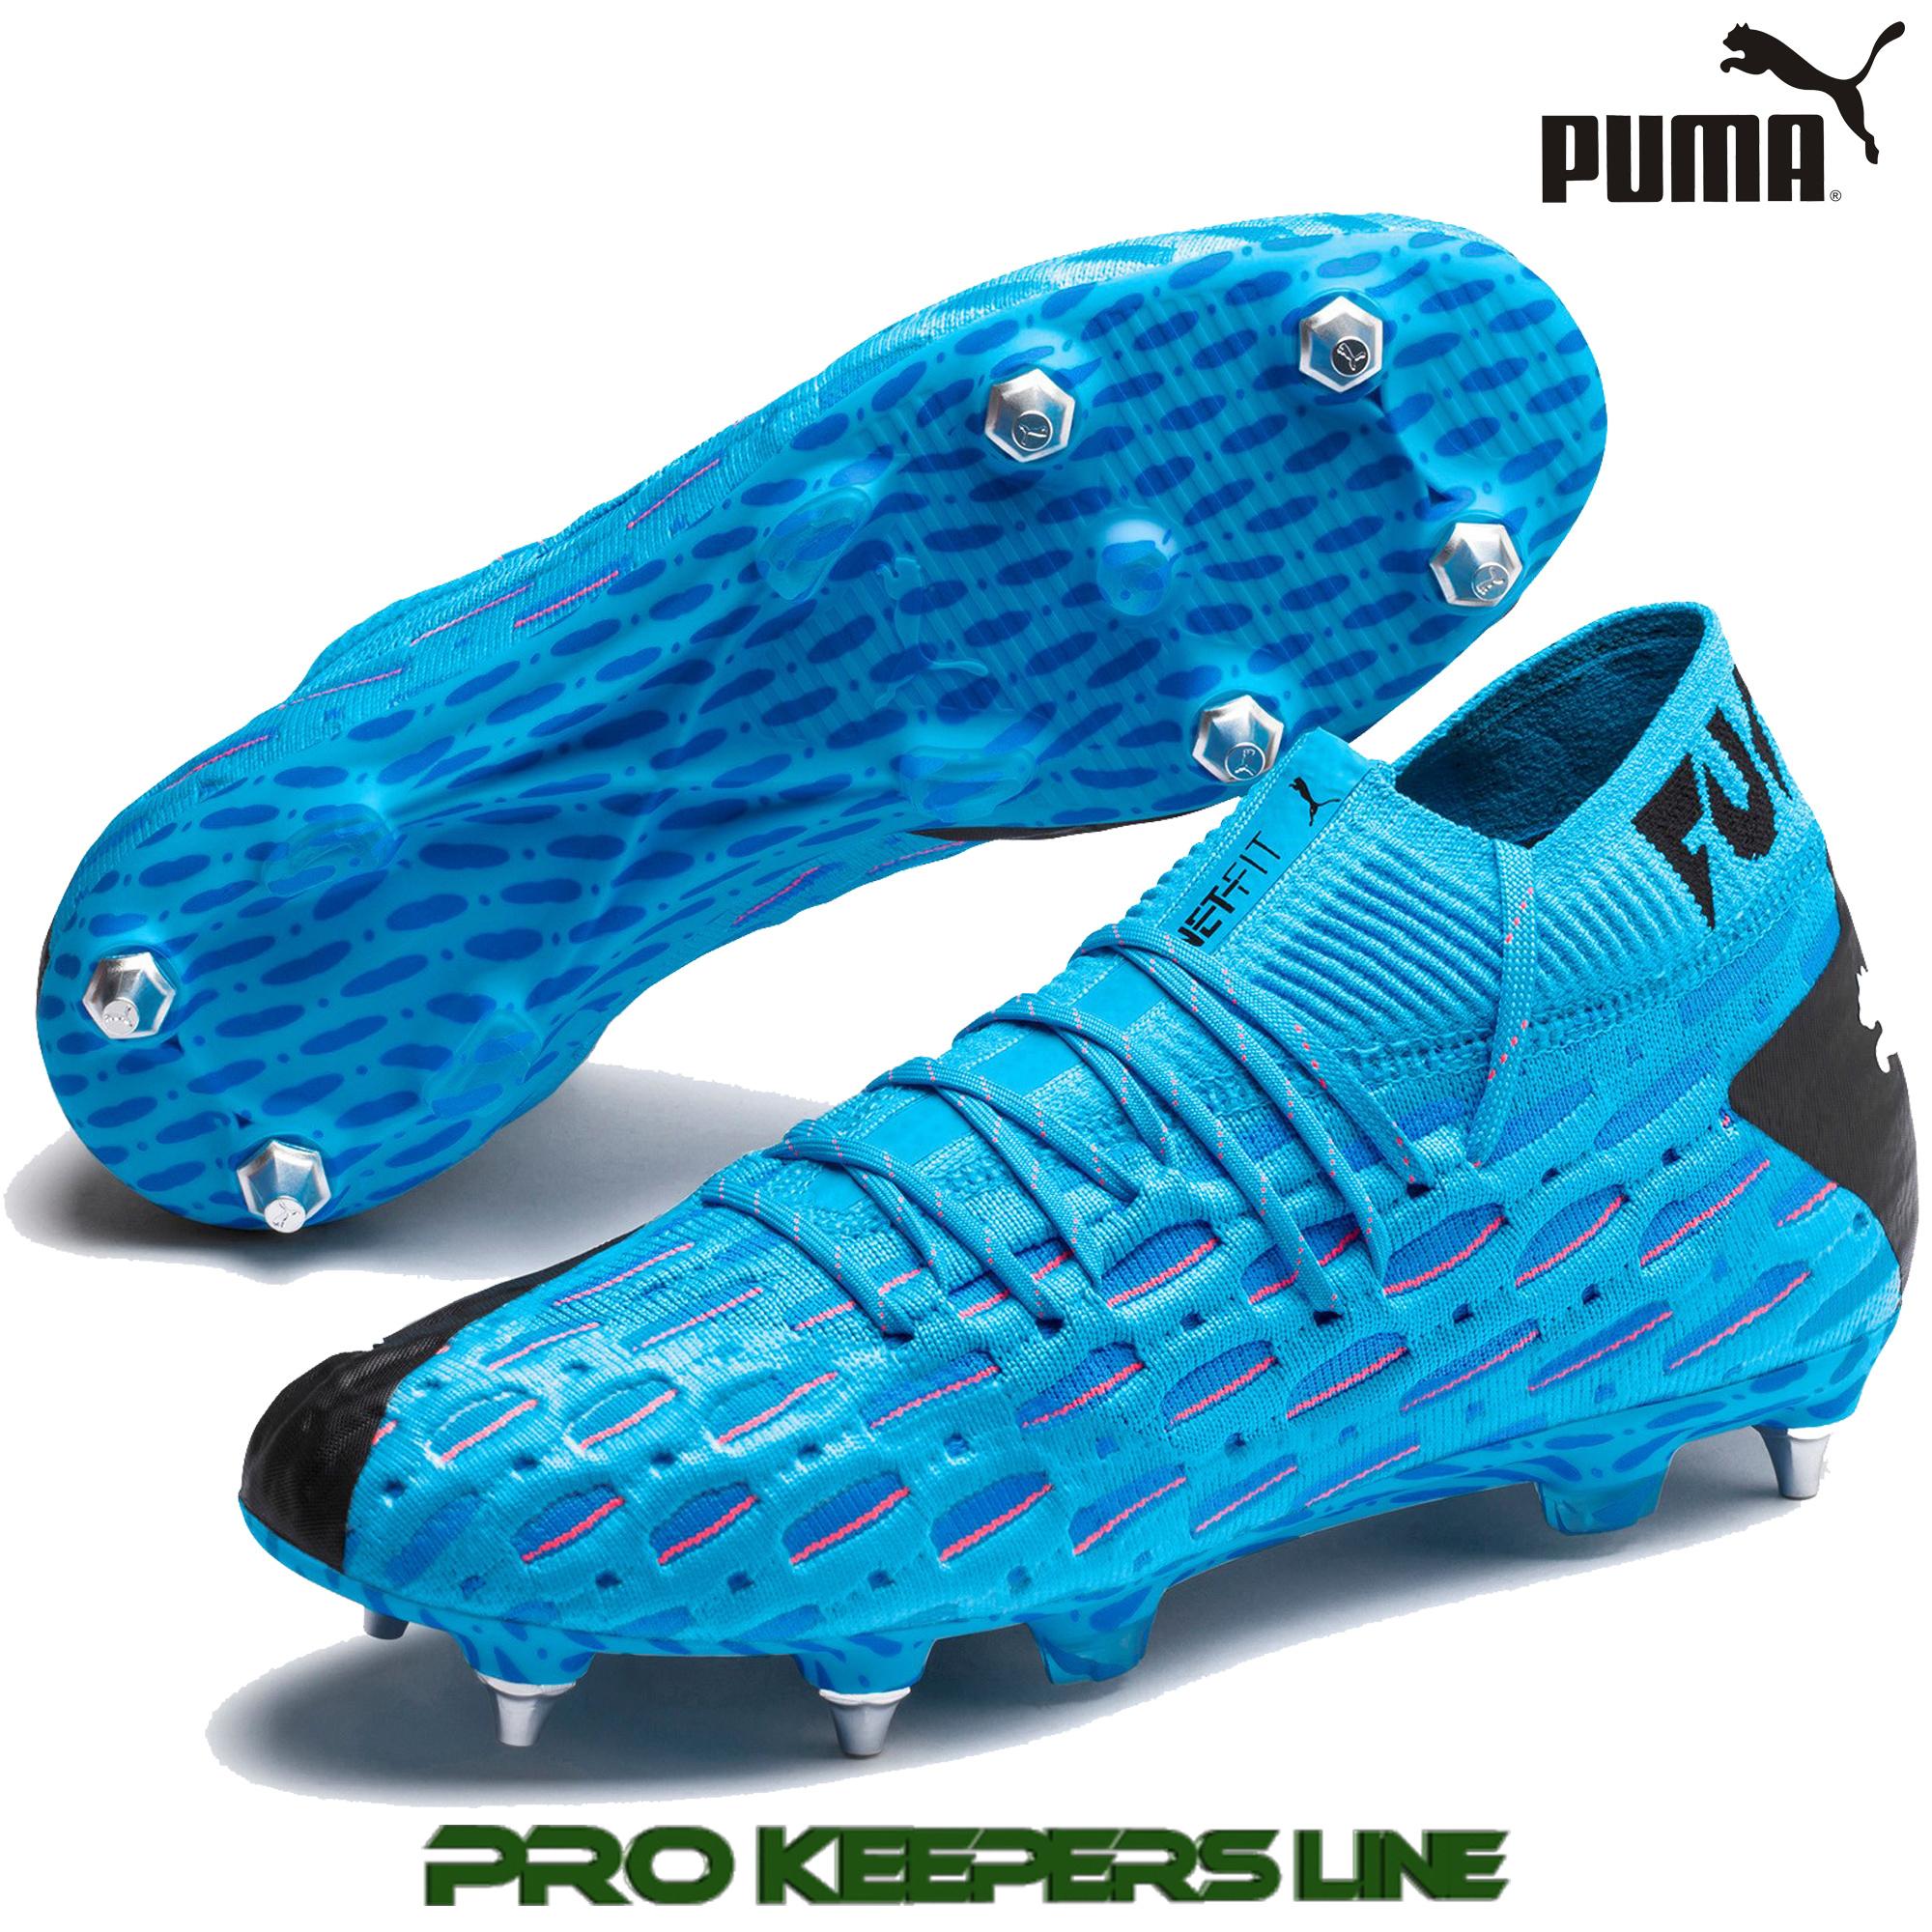 PUMA FUTURE 5.1 NETFIT MXSG LUMINOUS BLUE/ PUMA BLACK